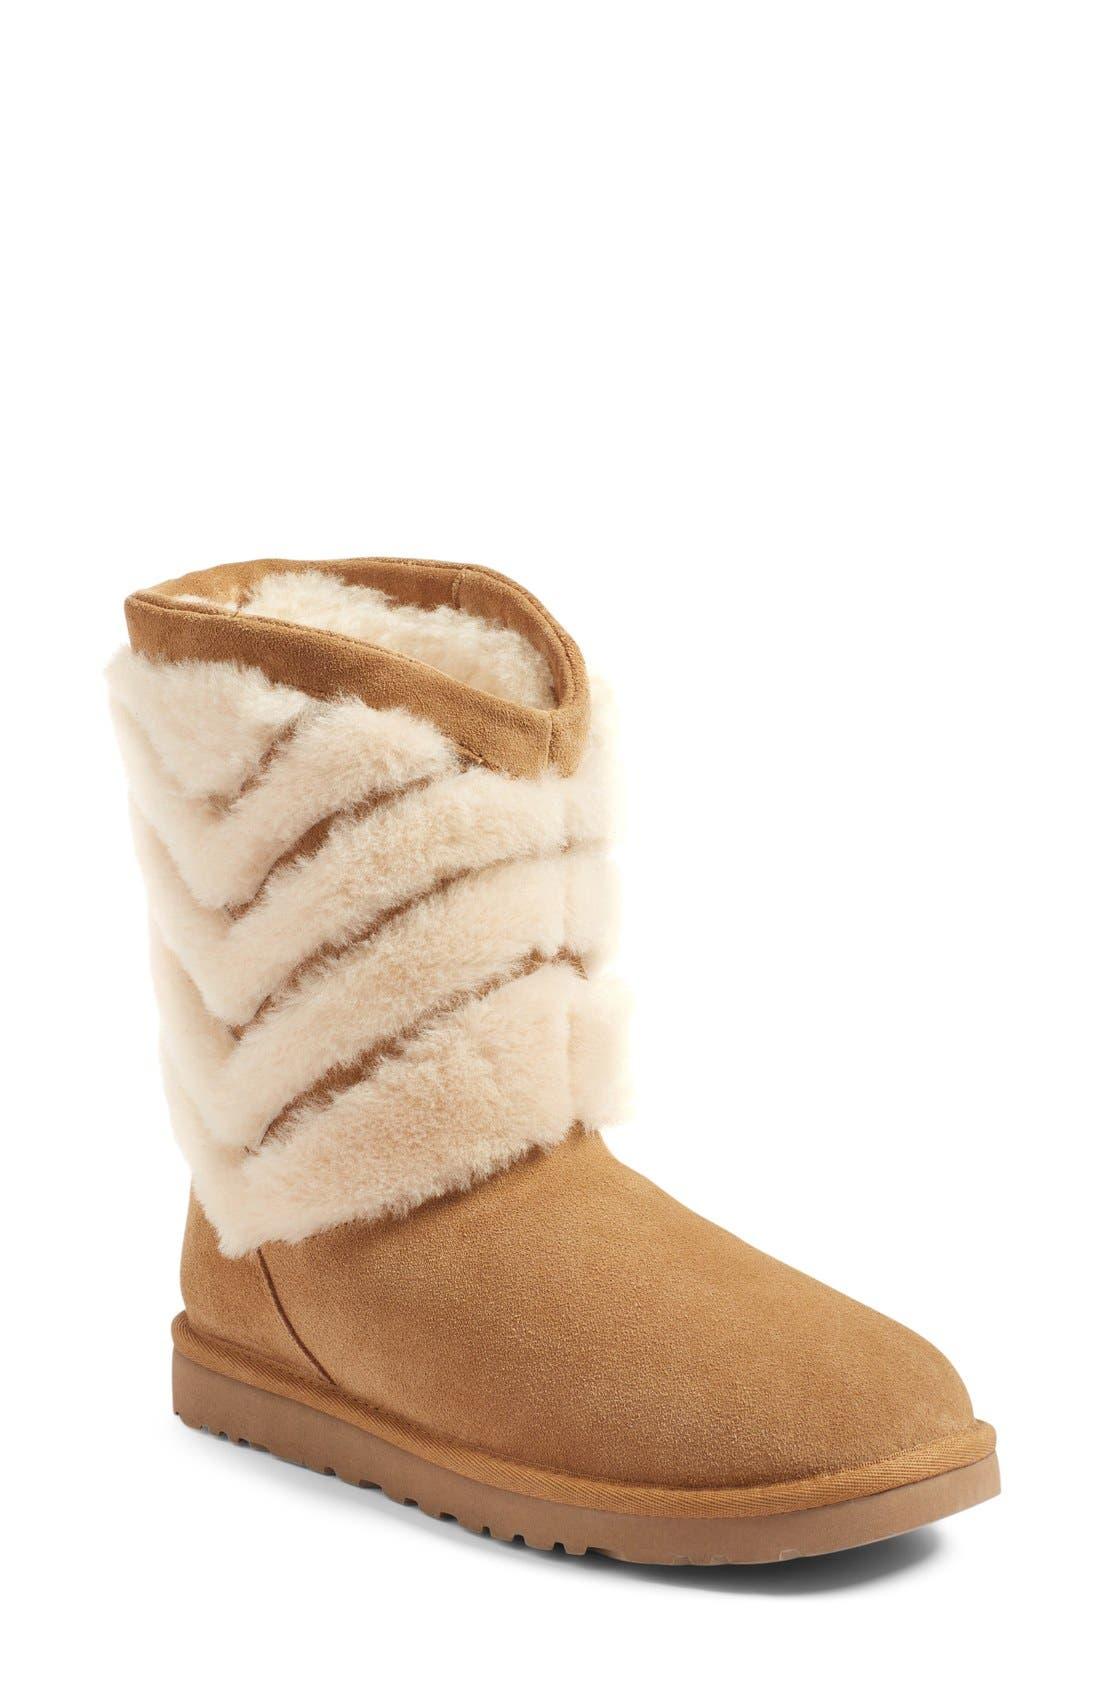 Main Image - UGG® Tania Genuine Shearling Boot (Women)